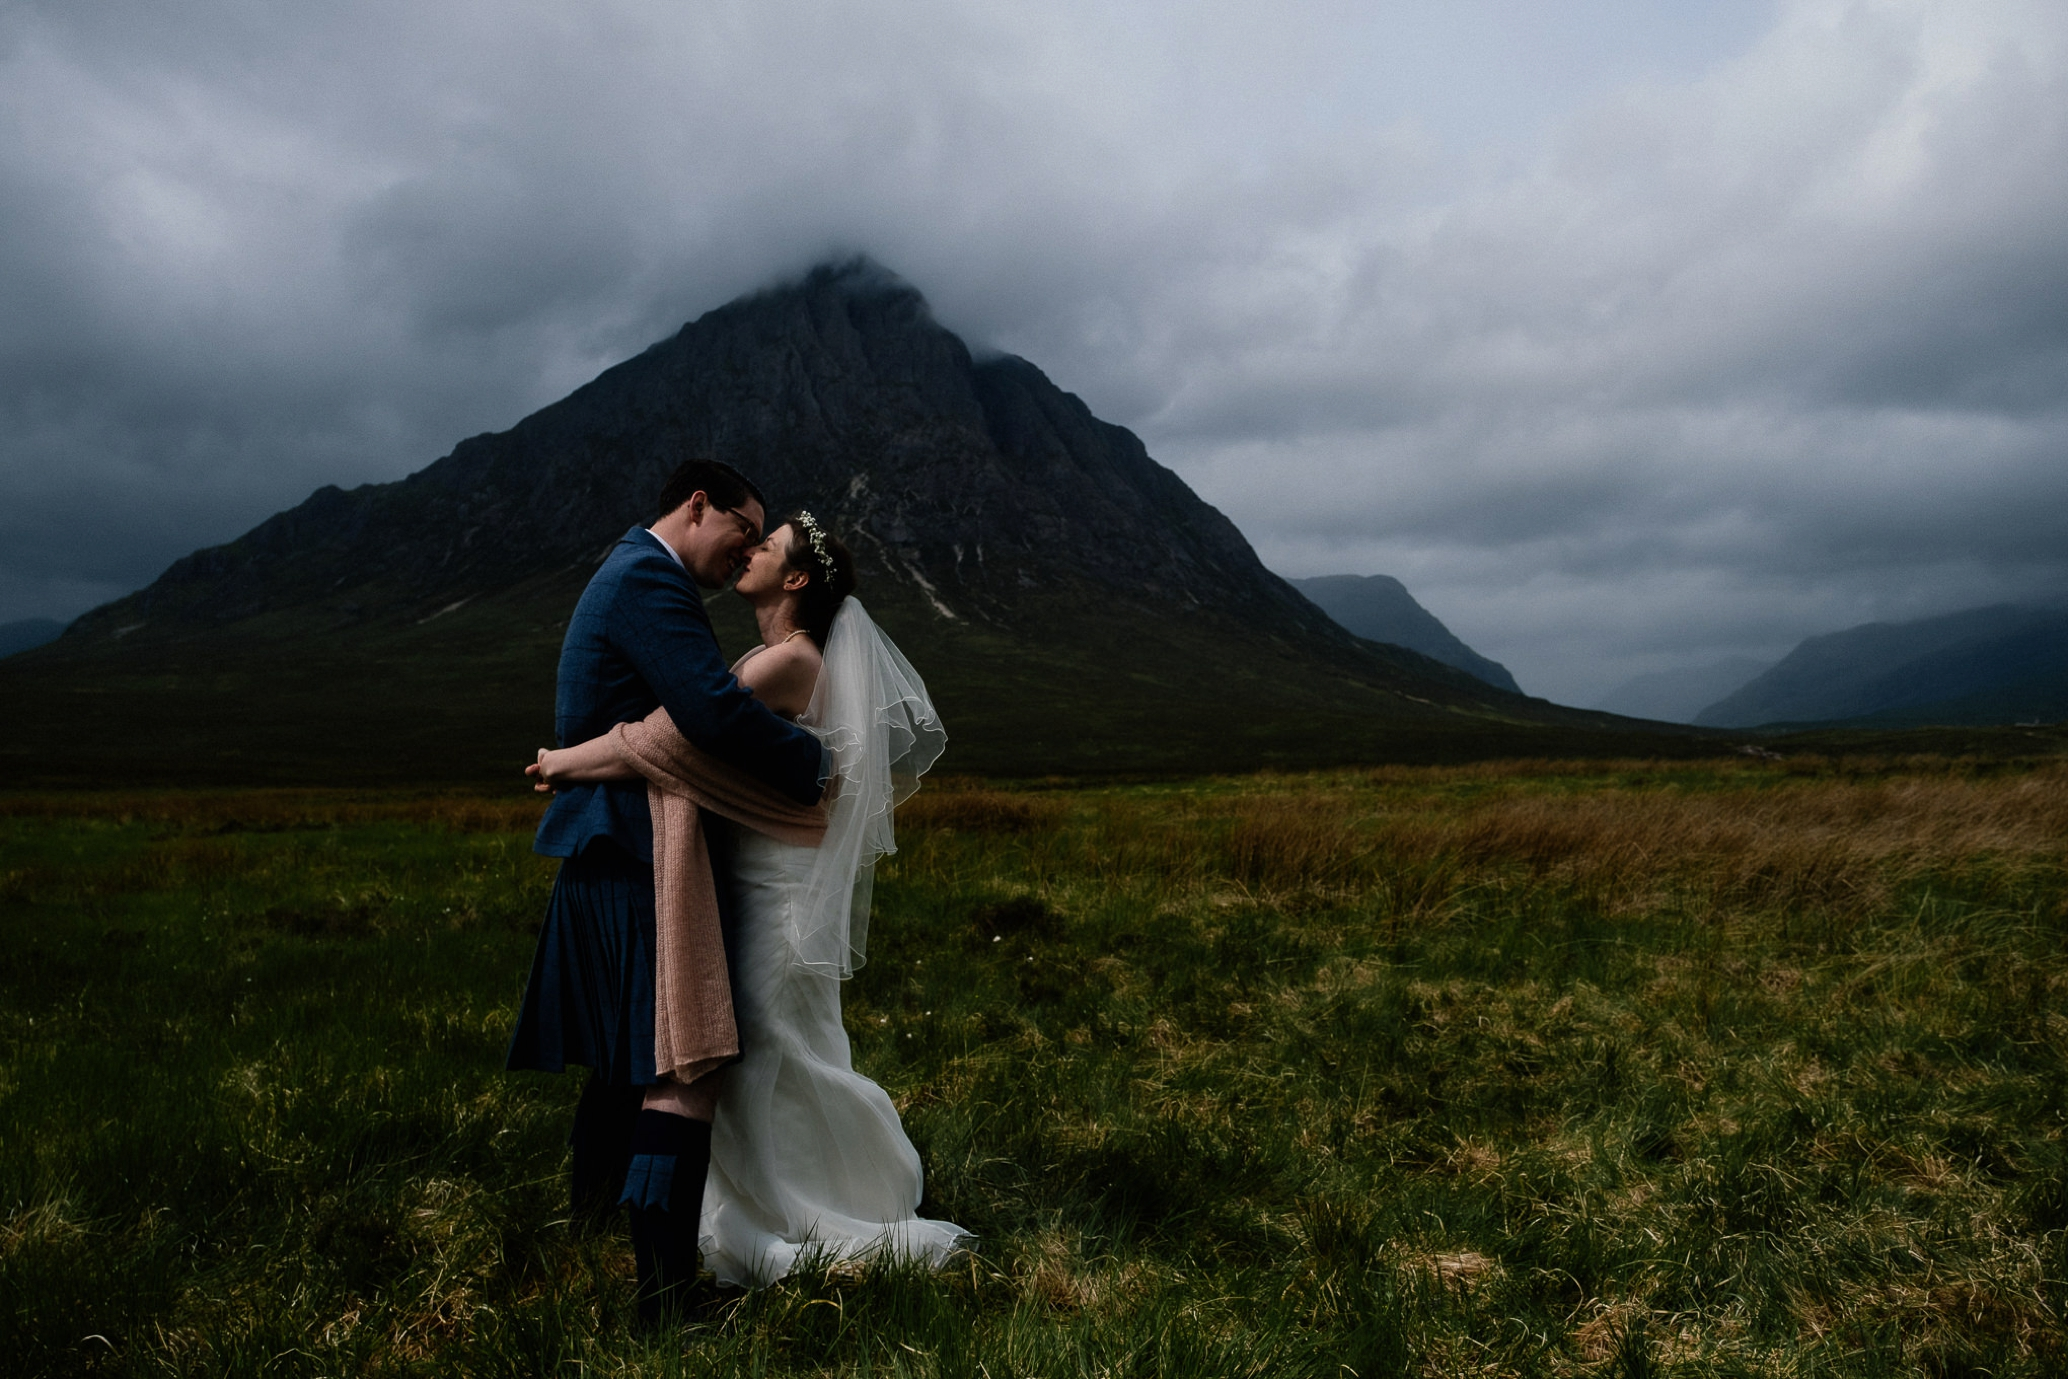 20170601_euan robertson weddings_050_WEB.jpg